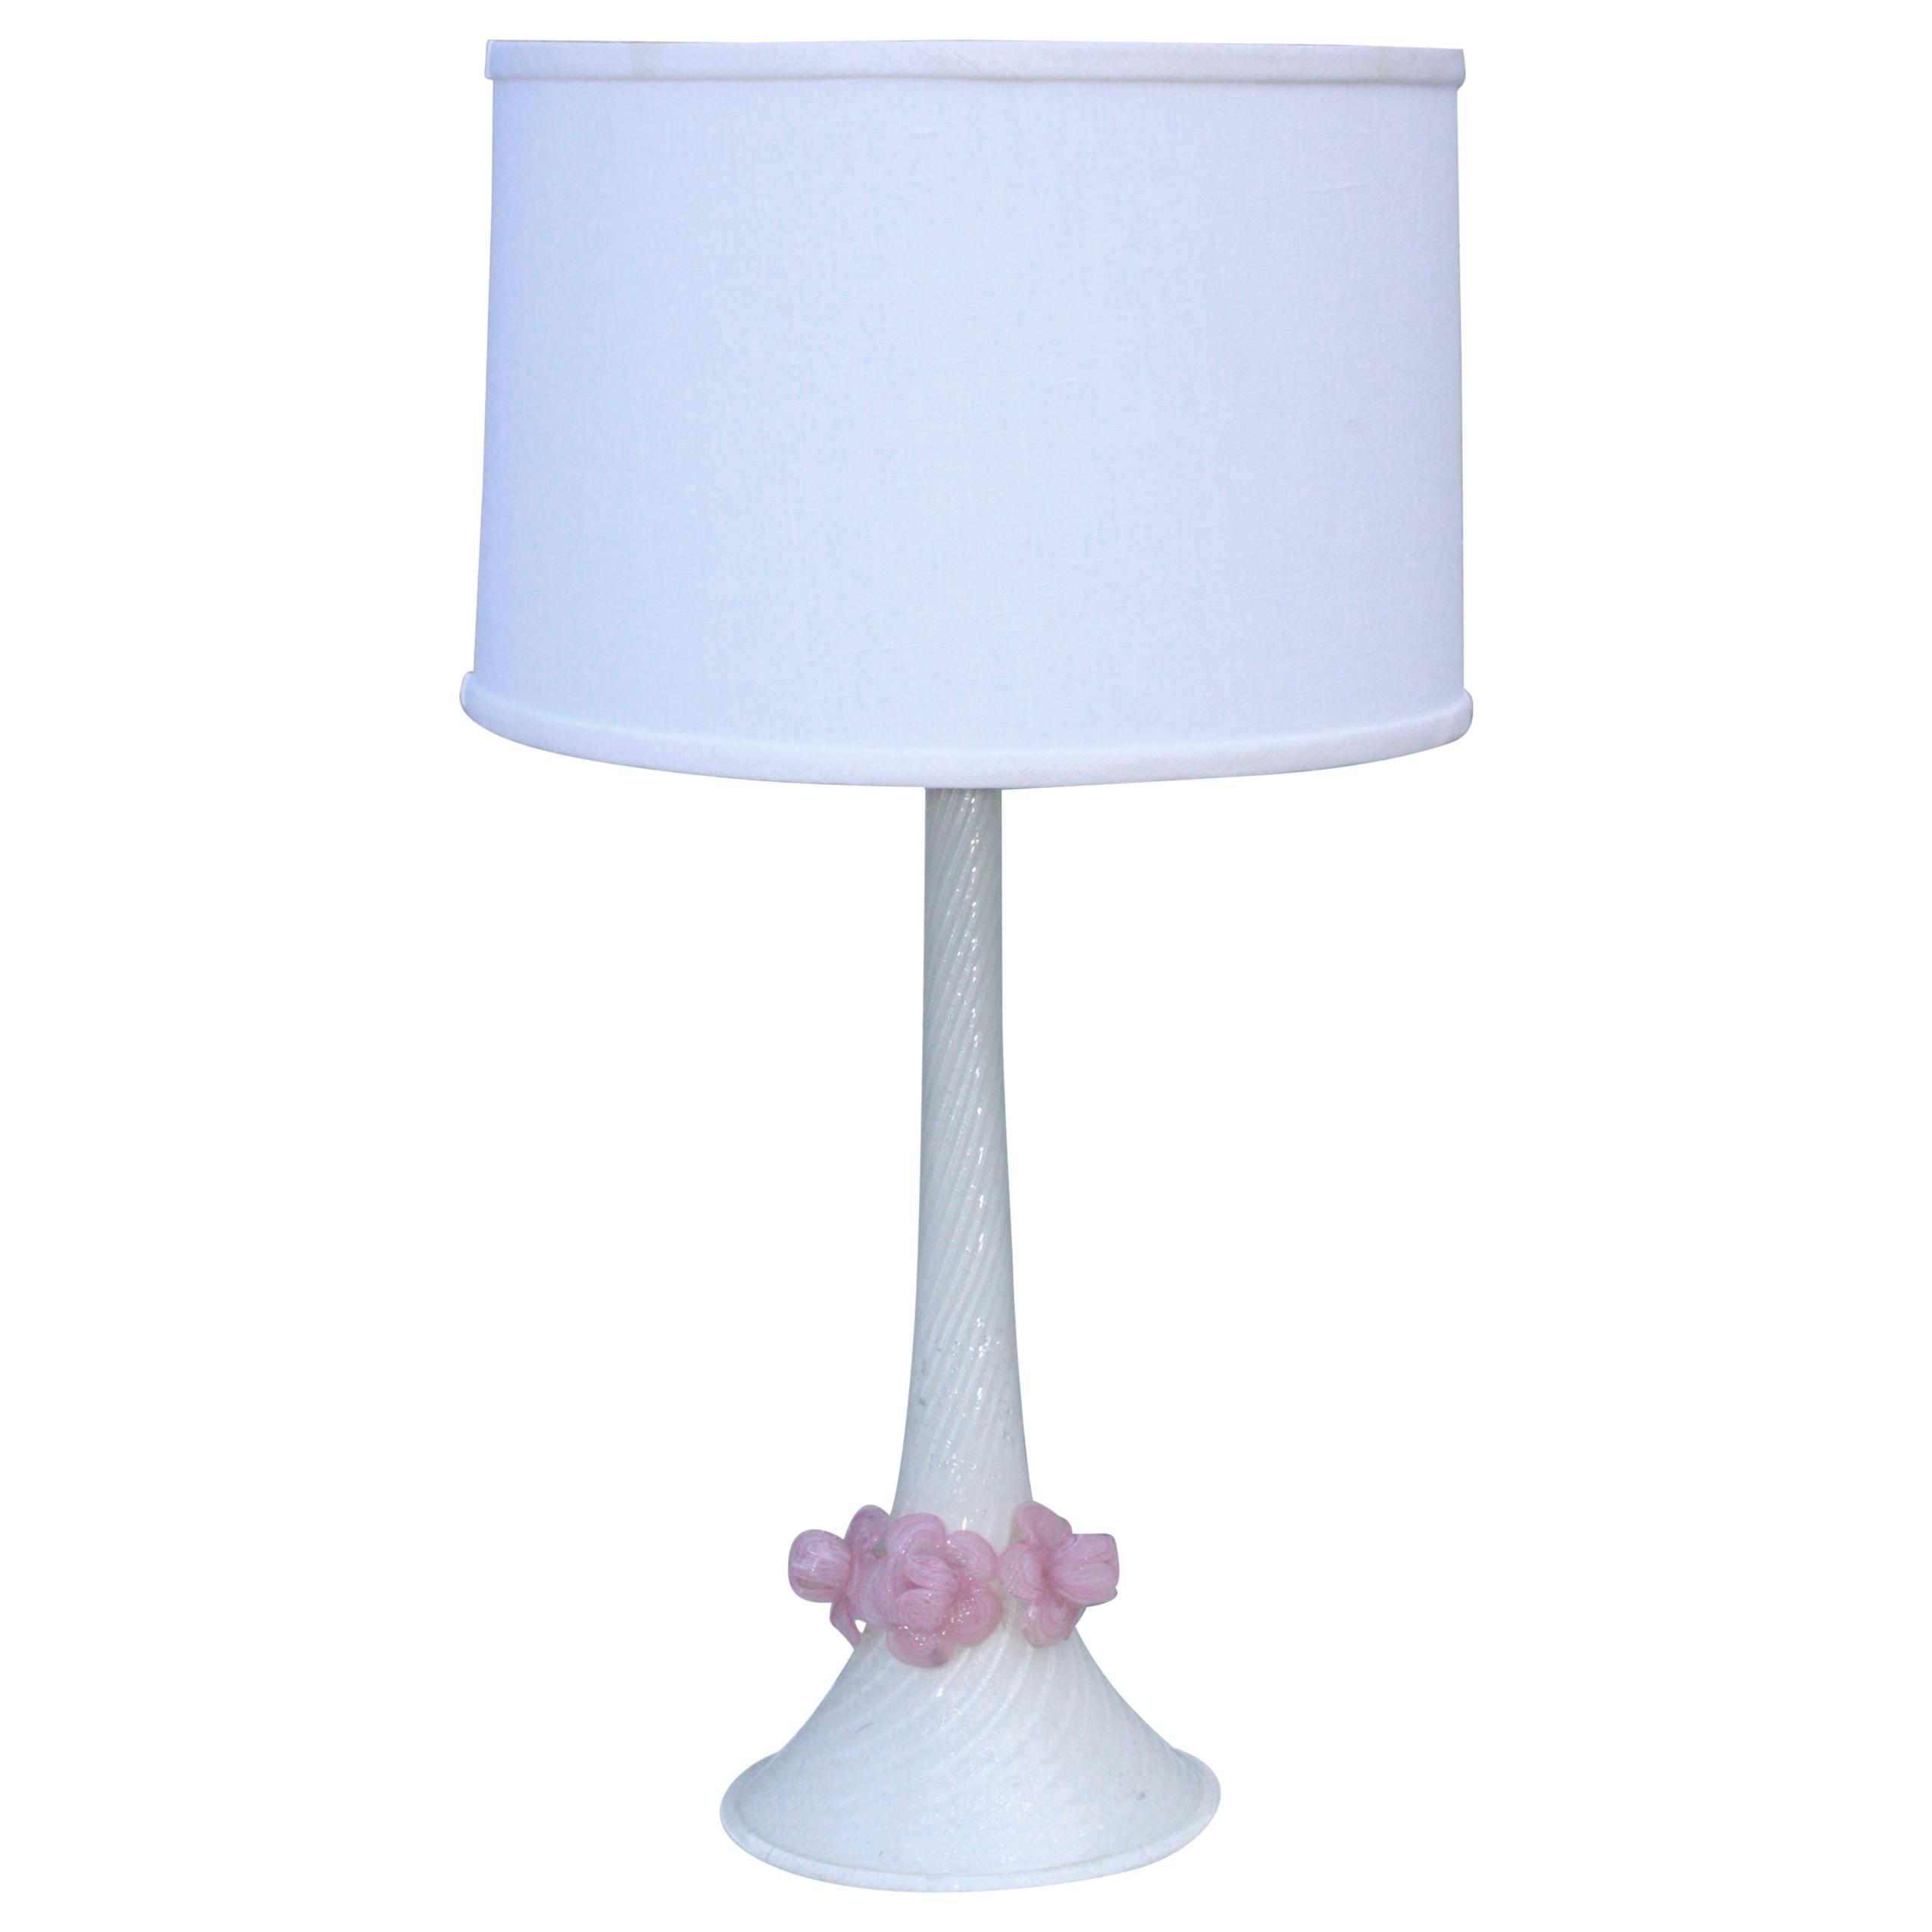 1950's Venetian Glass Table Lamp